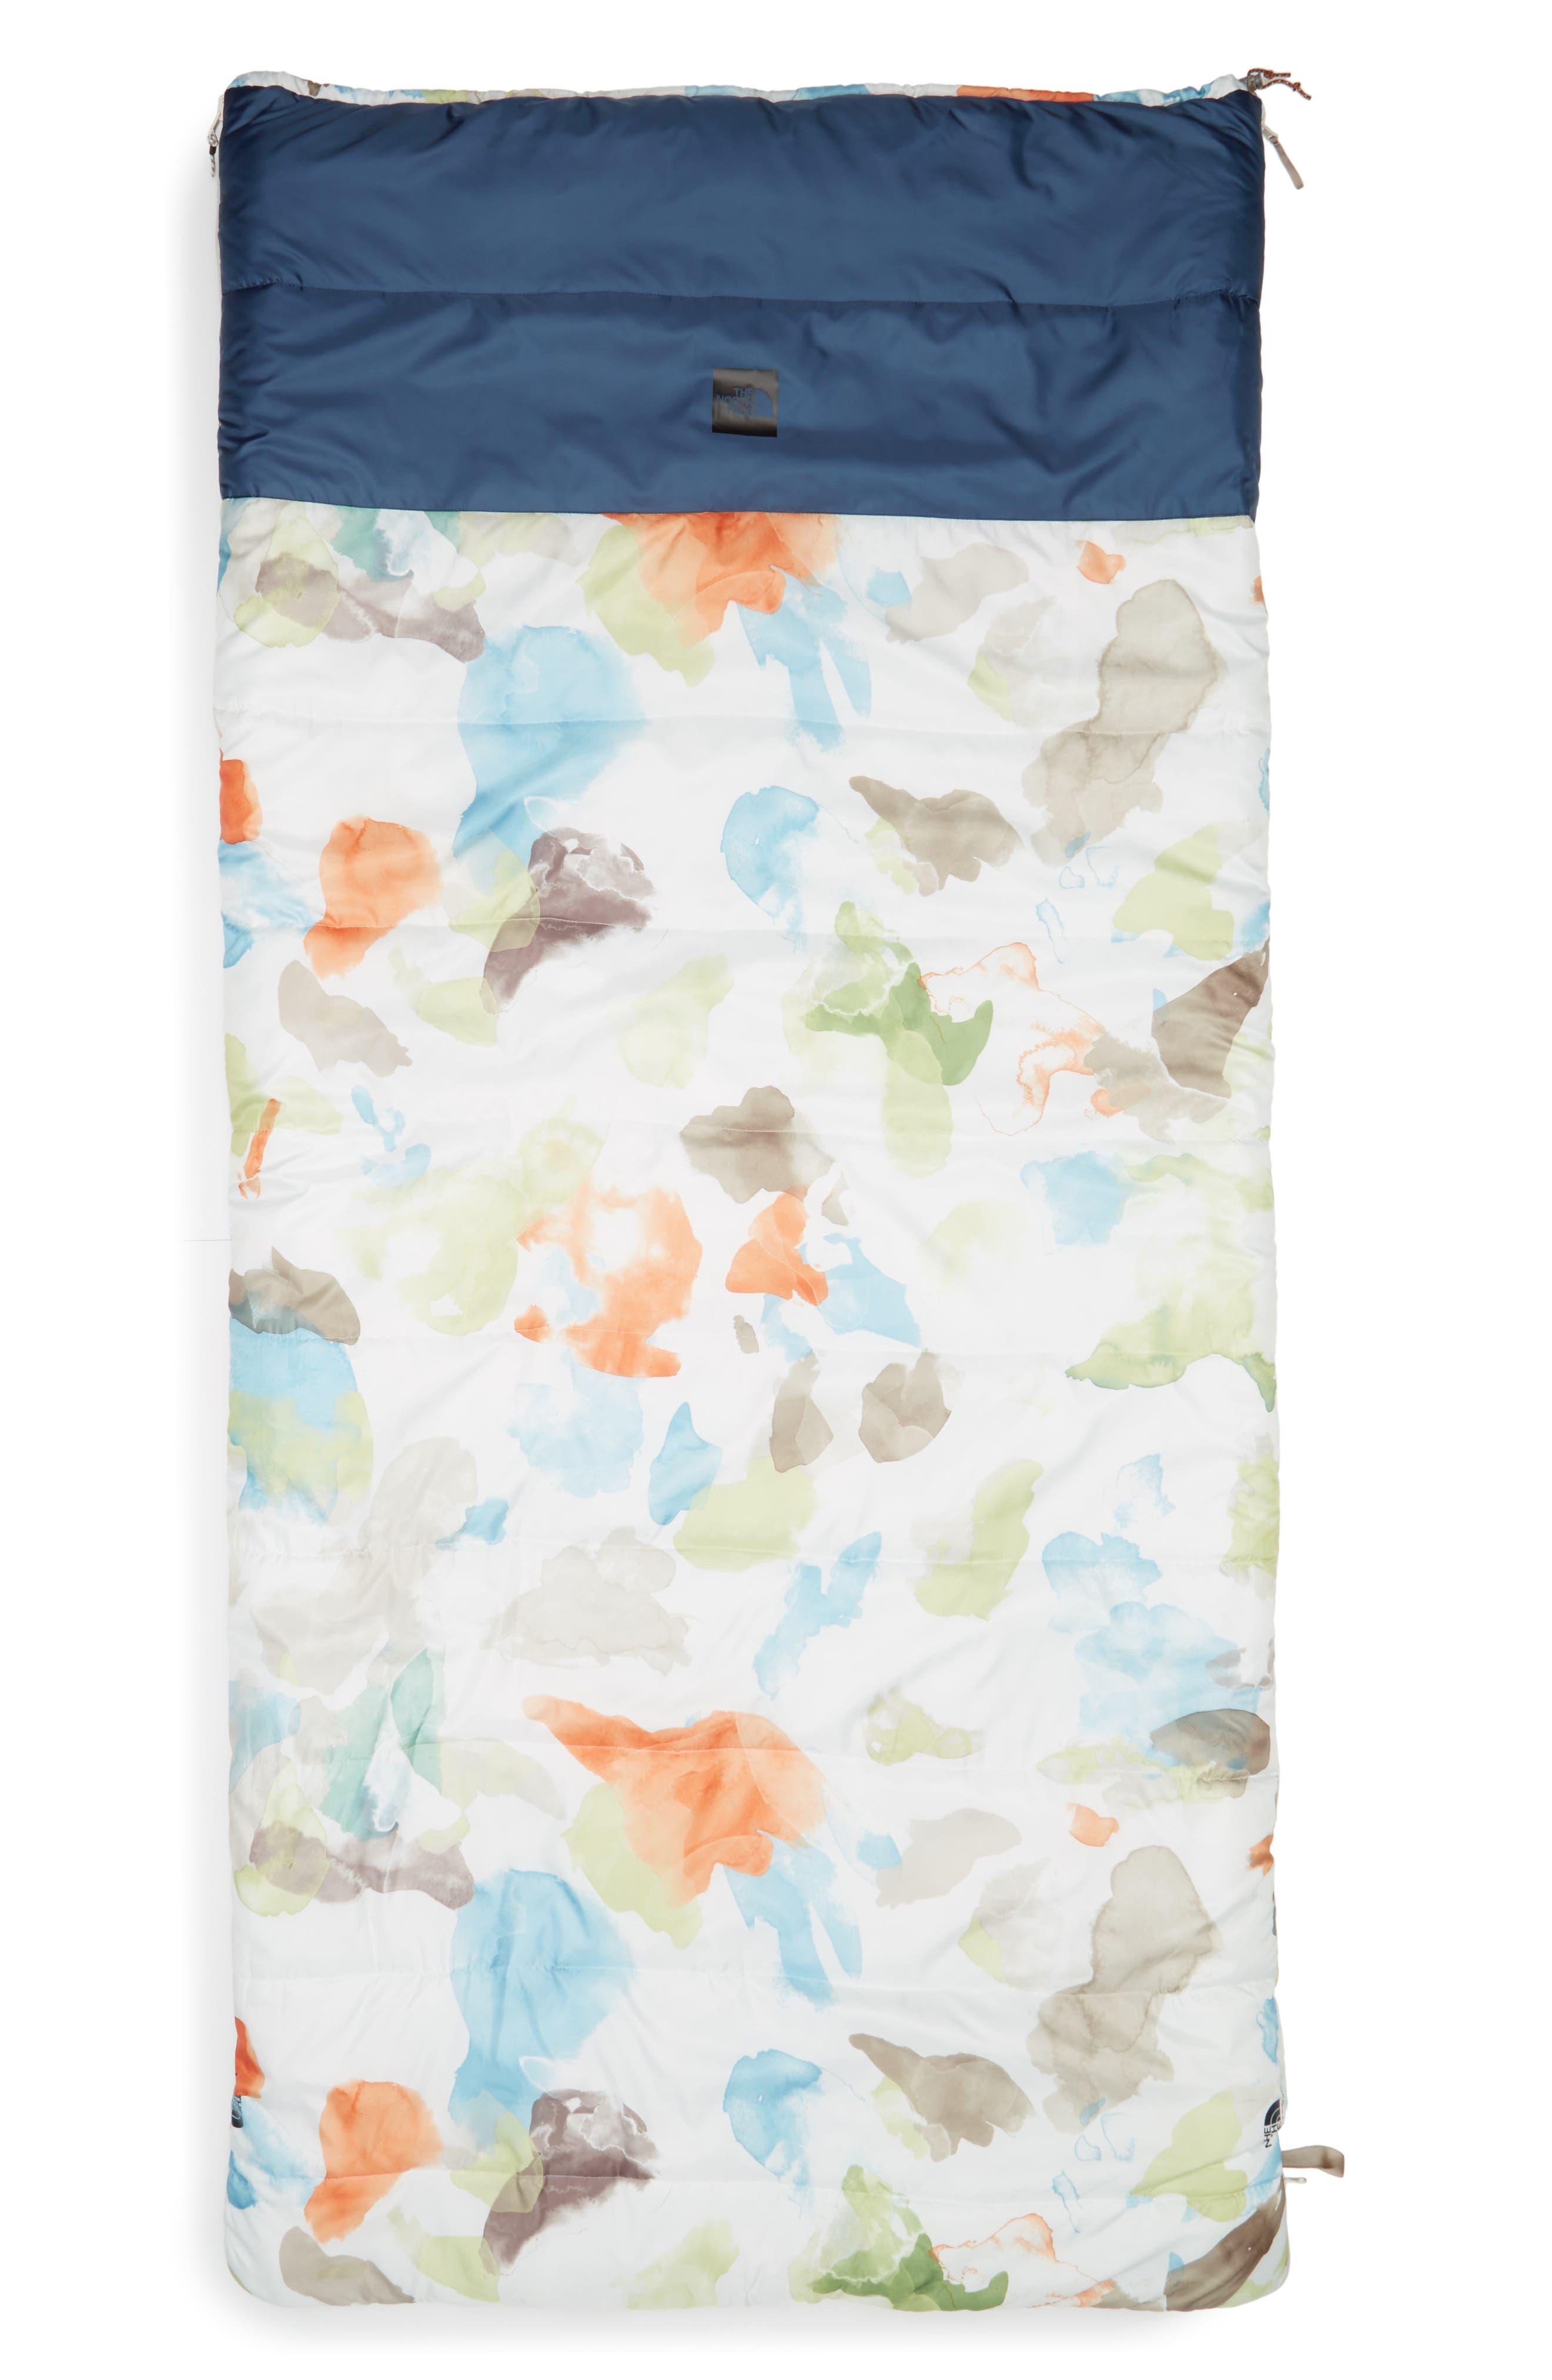 Homestead Twin Extra-Large Sleeping Bag,                             Main thumbnail 1, color,                             100